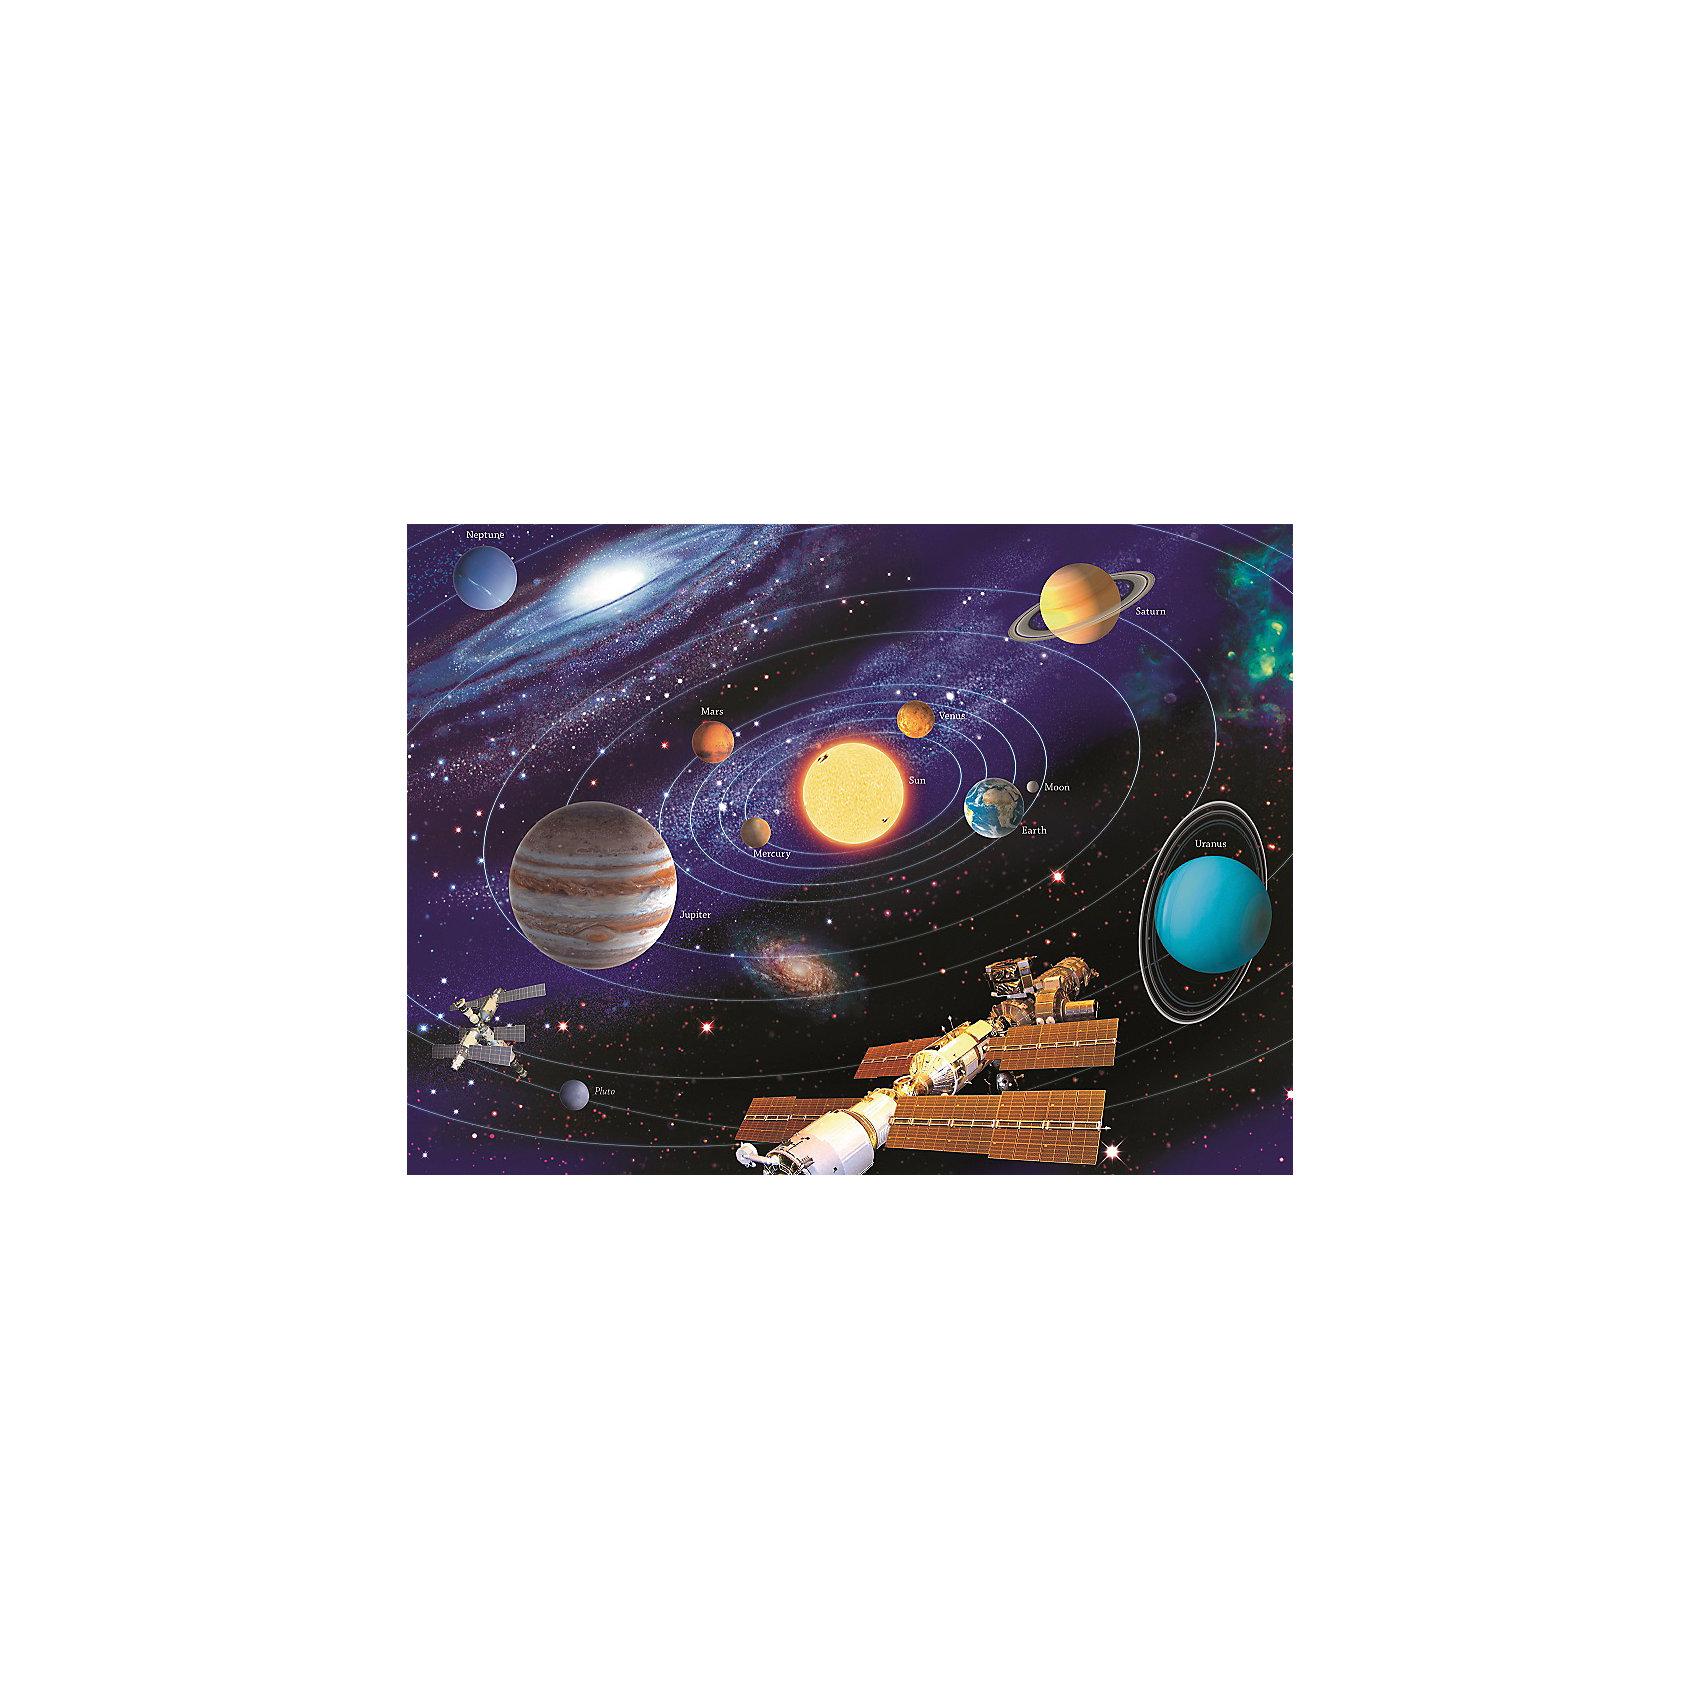 Ravensburger Пазл «Солнечная система» XXL 200 деталей, Ravensburger пазлы magic pazle объемный 3d пазл эйфелева башня 78x38x35 см